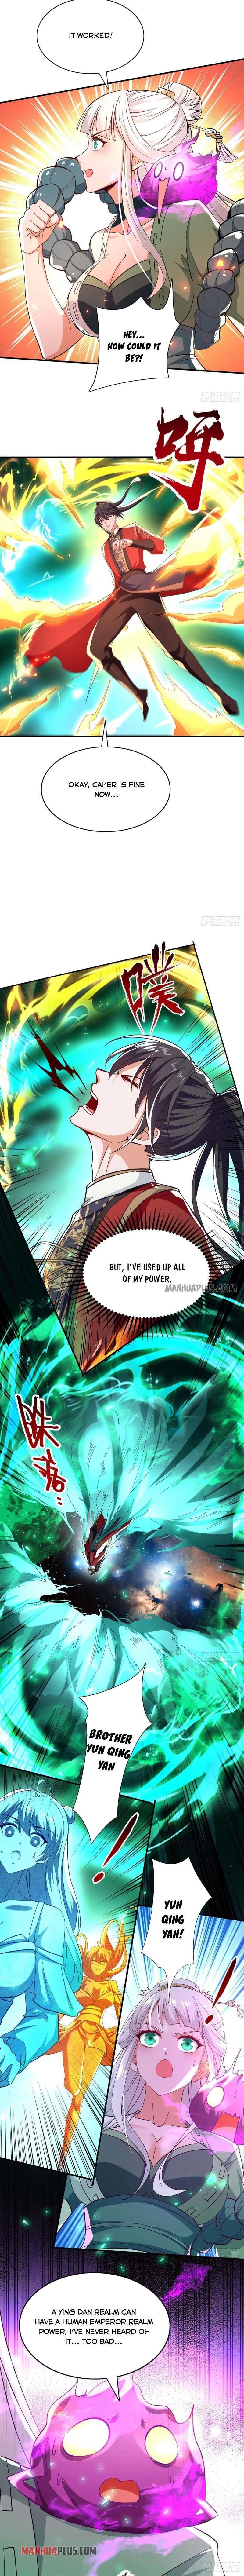 Return Of Immortal Emperor Chapter 215 page 5 - Mangakakalots.com